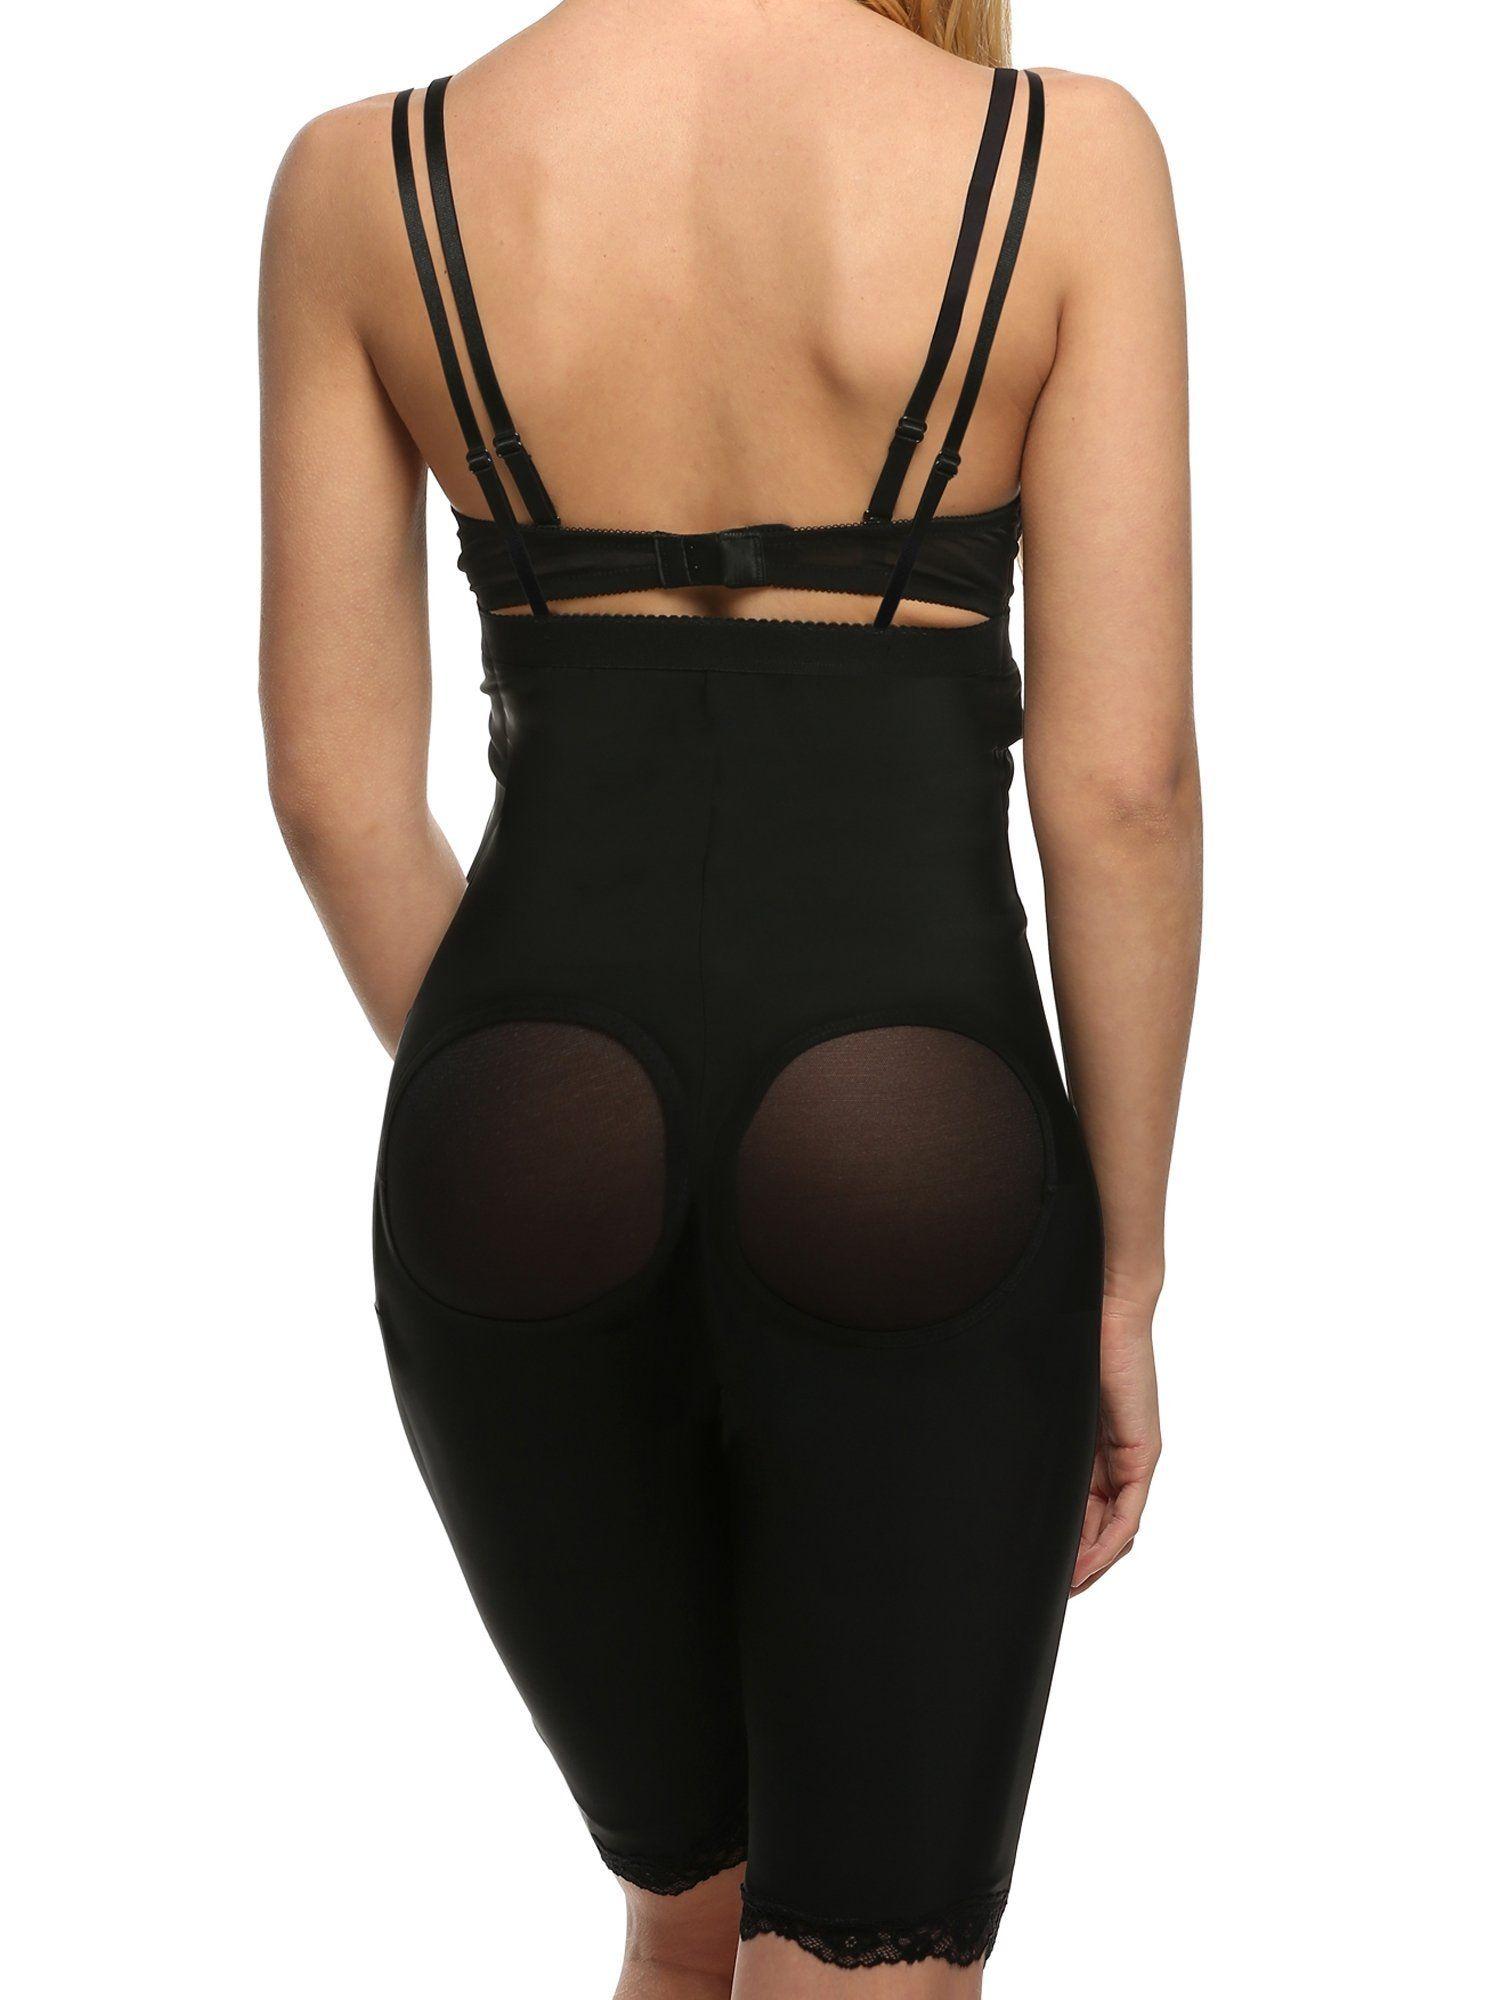 f3e7afb6fad204 Etouji Womens Hi Waist Tummy Shapewear Girdle Panties Underwear Plus  SizeBlackXL     Click image for more details. (Note Amazon affiliate link)